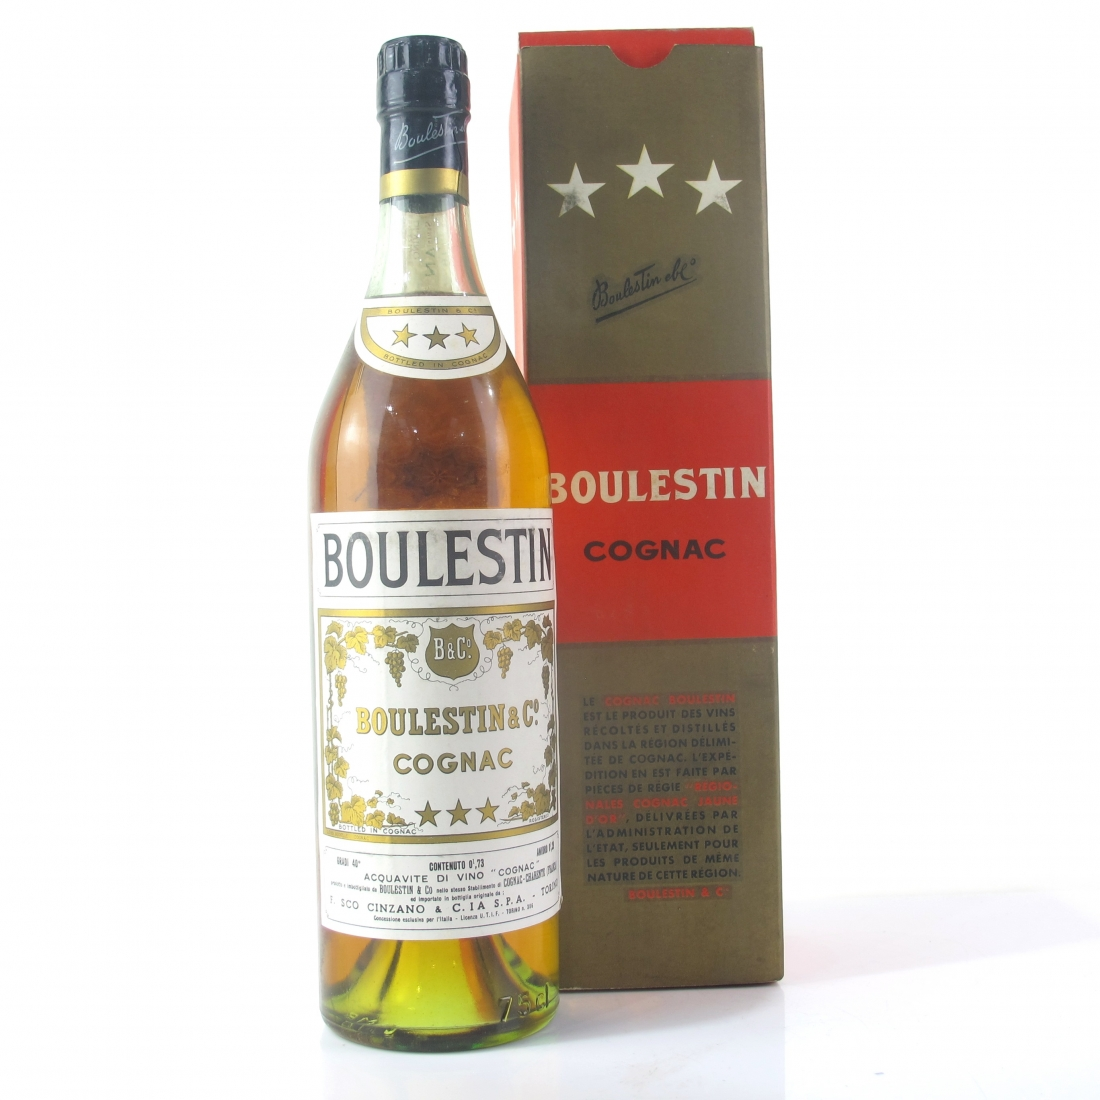 Boulestin 3-Star Cognac 1960s